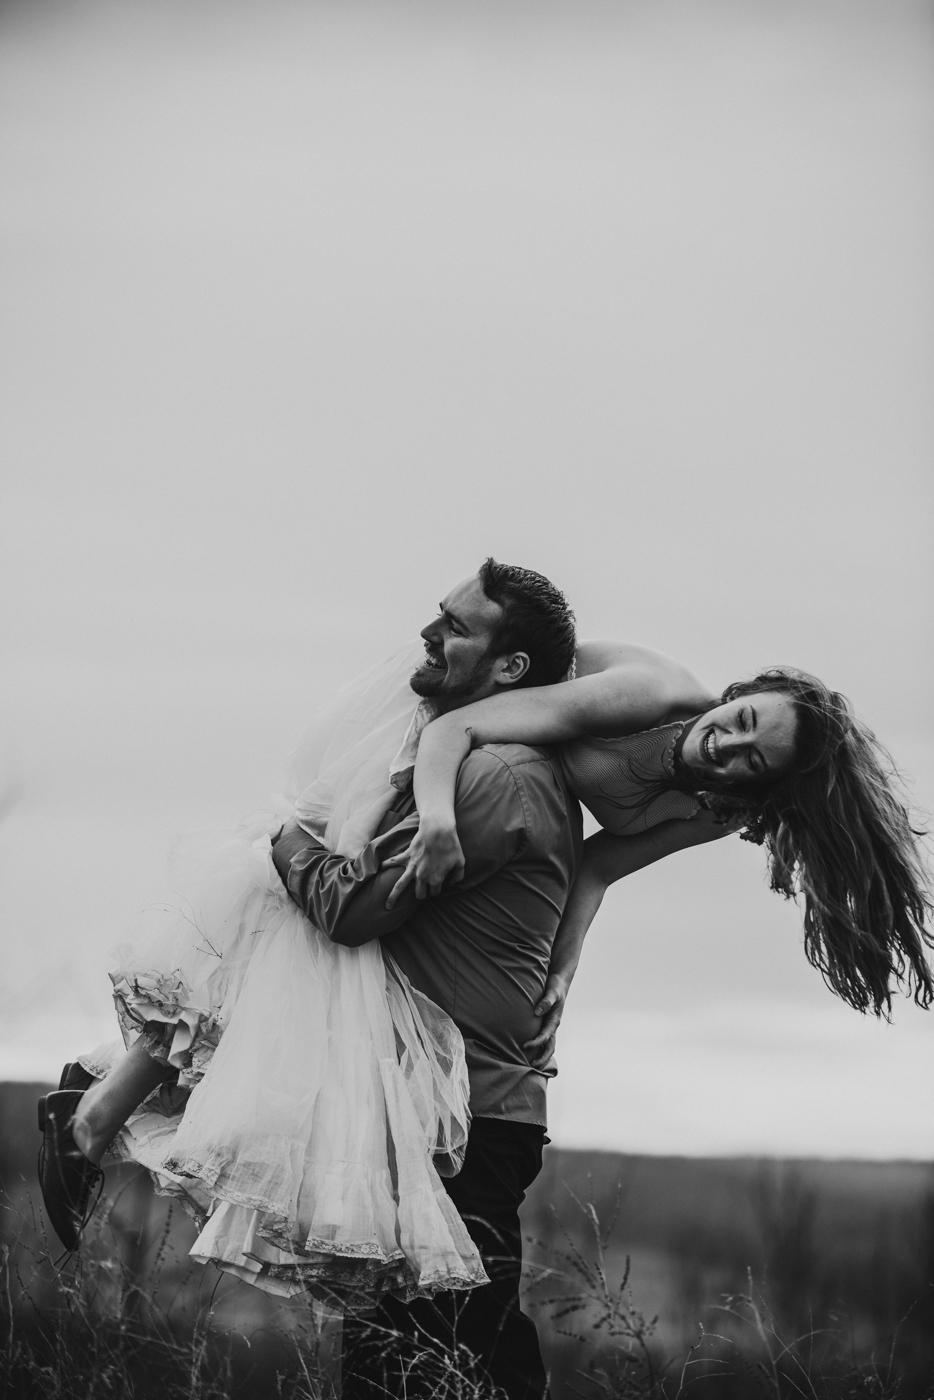 FortSt.John_photographer_TyraEPhotography_Wedding_Couple_Family_Photograhy_DawsonCreek_Elopement_Bride_Boduoir_Portraits-39.jpg